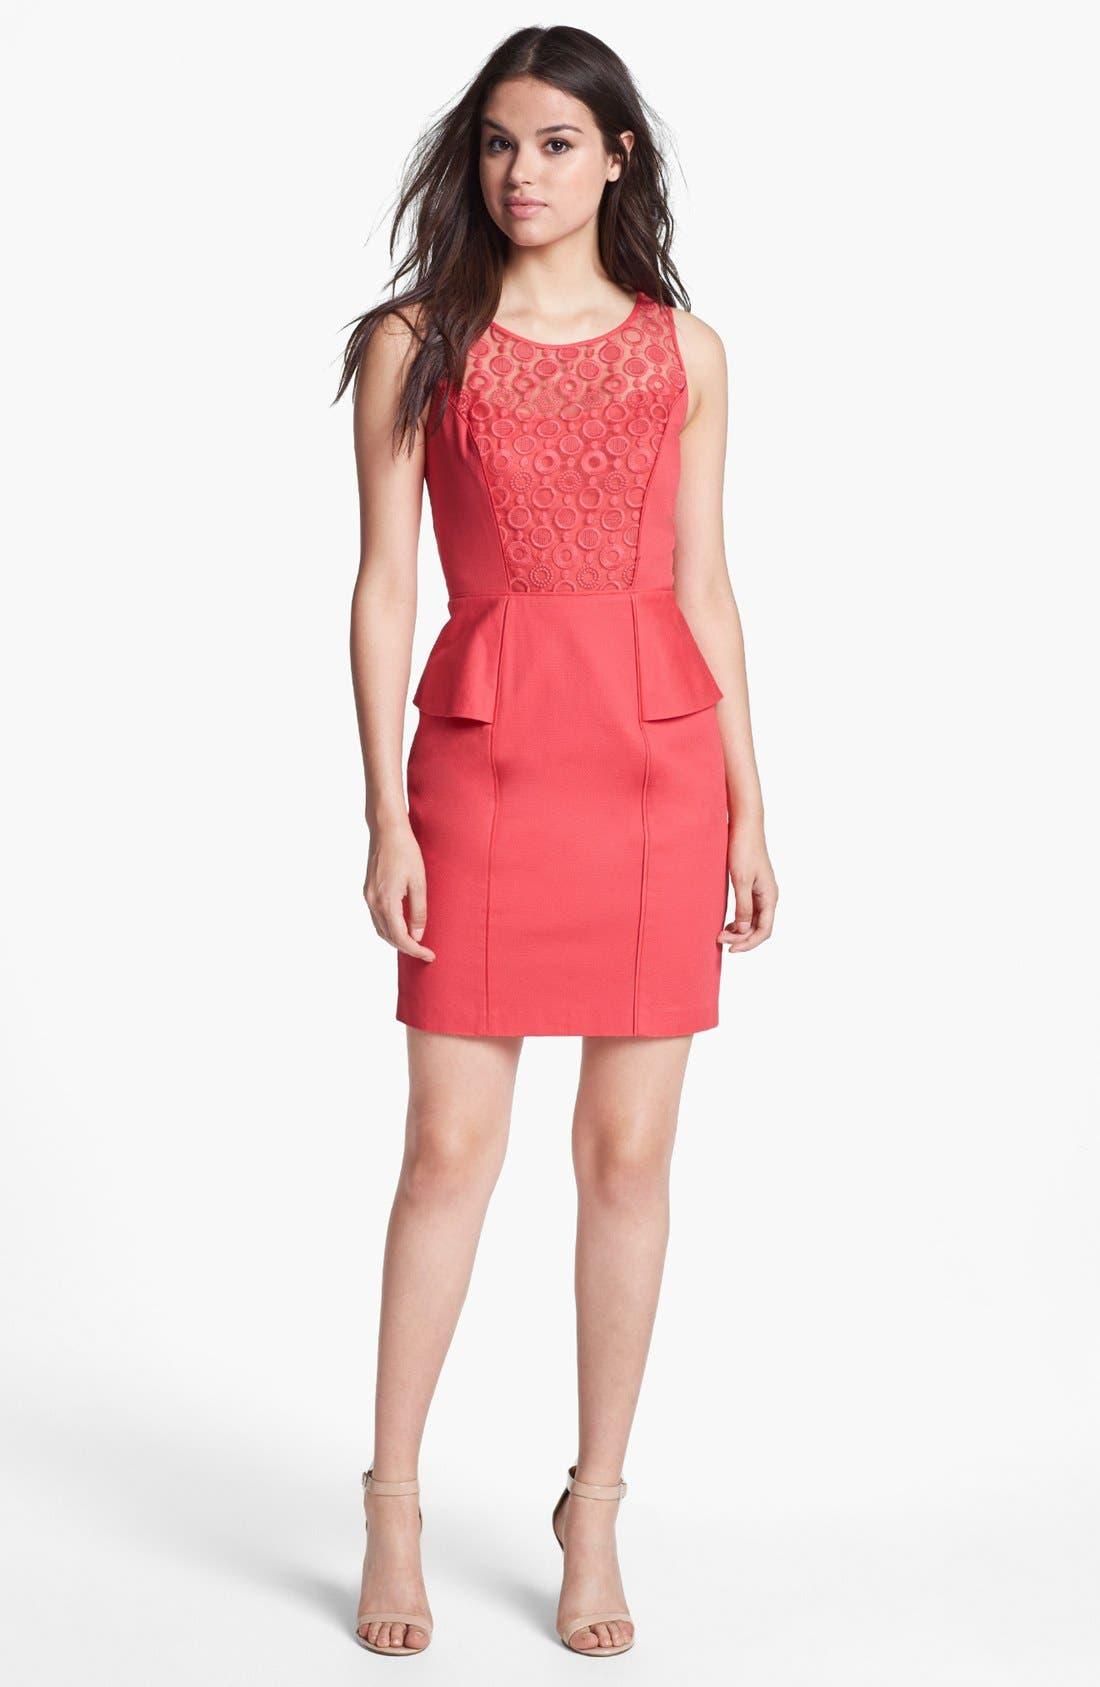 Alternate Image 1 Selected - Jessica Simpson Lace Yoke Sleeveless Peplum Sheath Dress